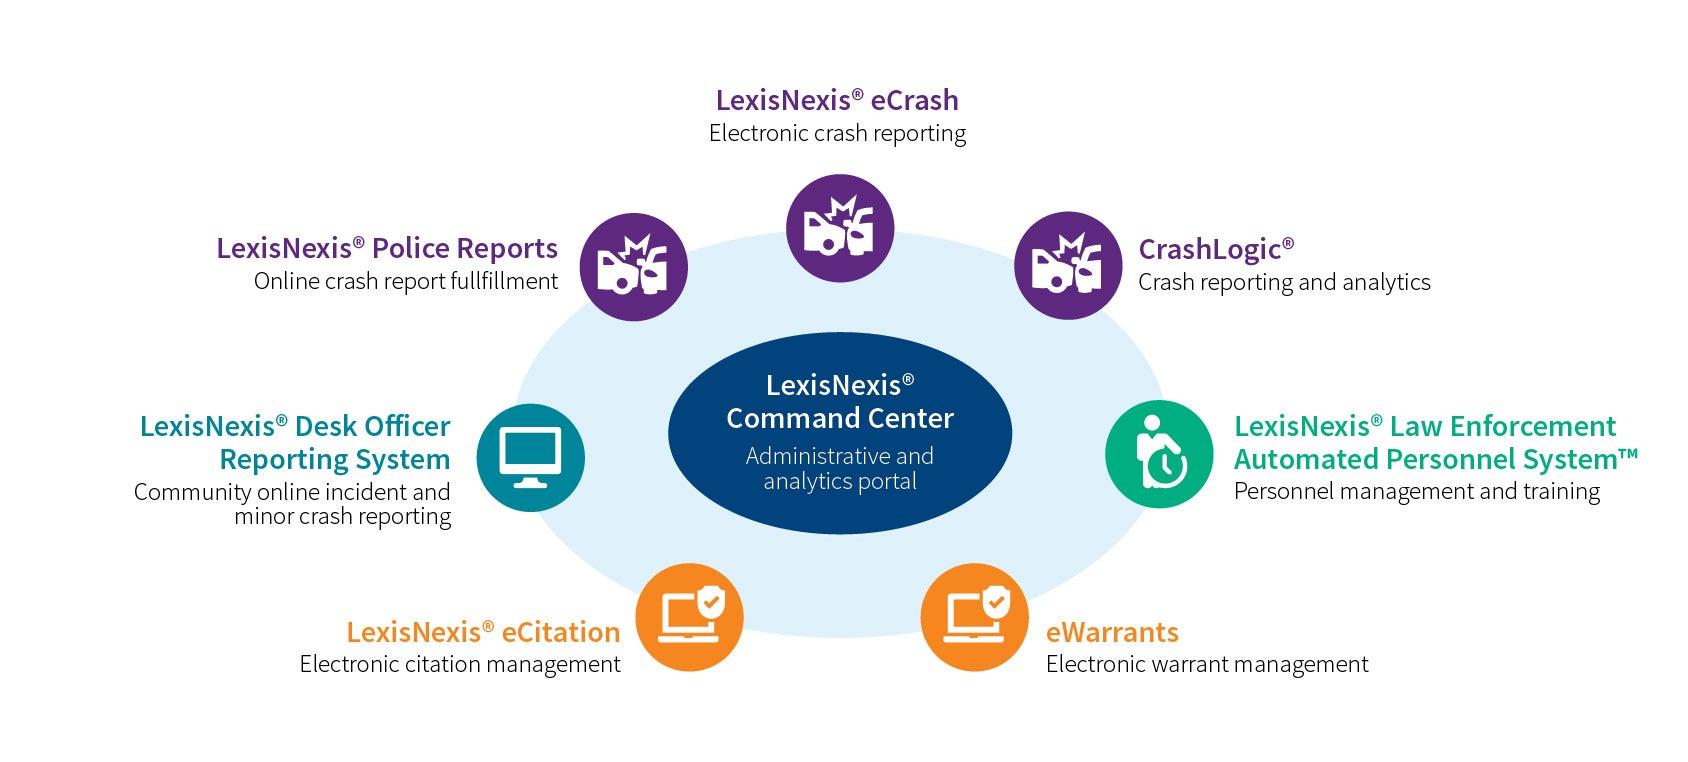 Coplogic Solutions Incident and Crash Reporting | LexisNexis